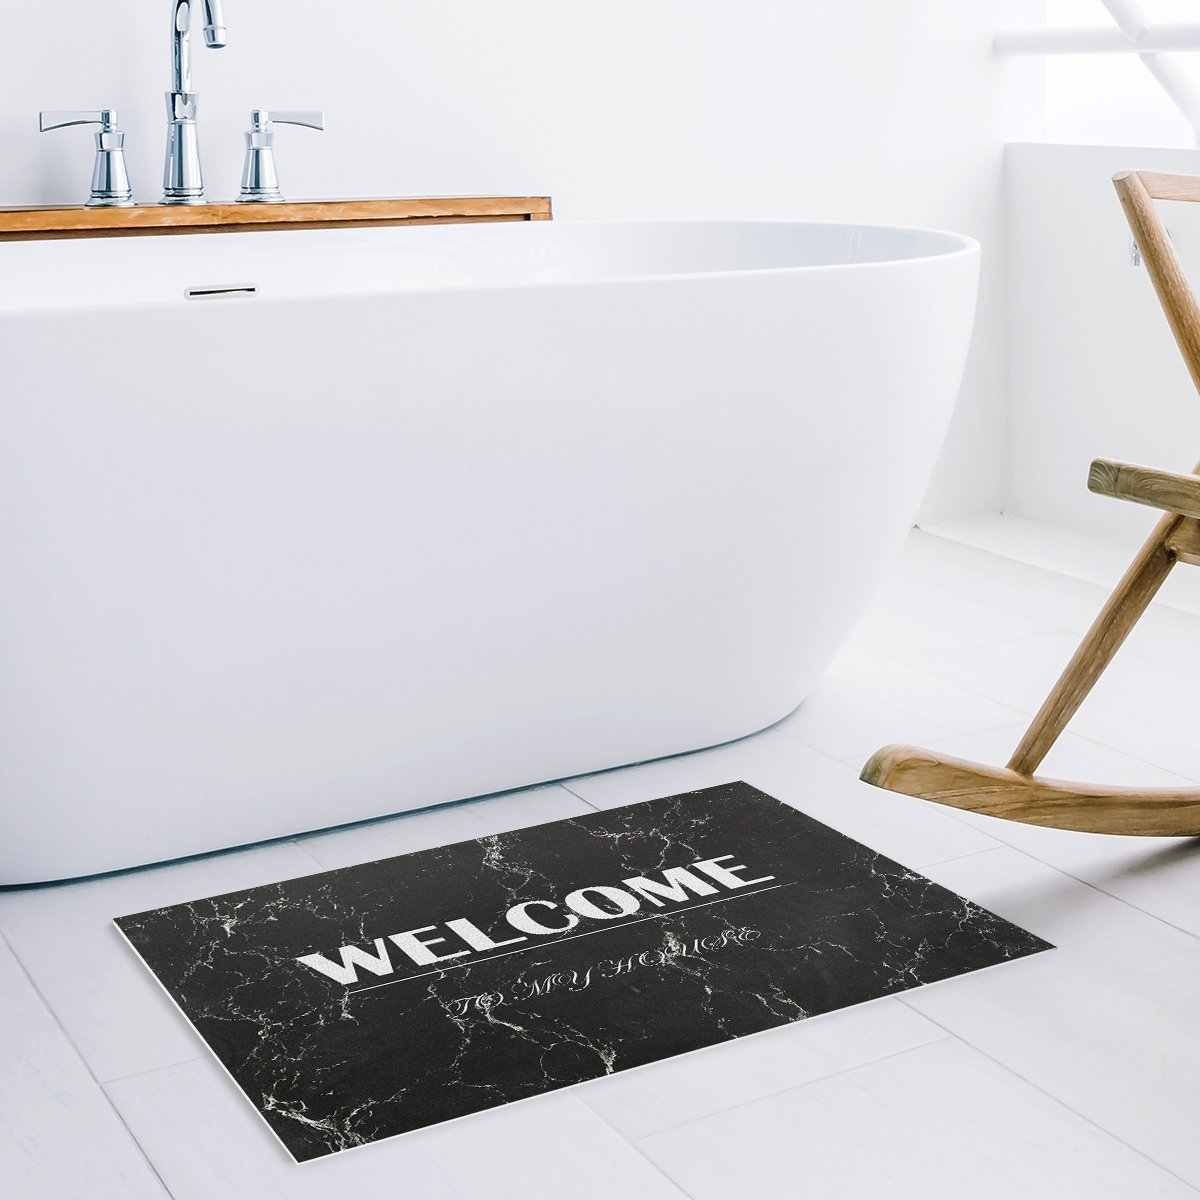 White Welcome On Black Marble Texture Decorative Pattern Door Mats Kitchen Floor Bath Entrance Rug Mat Indoor Bathroom Decor